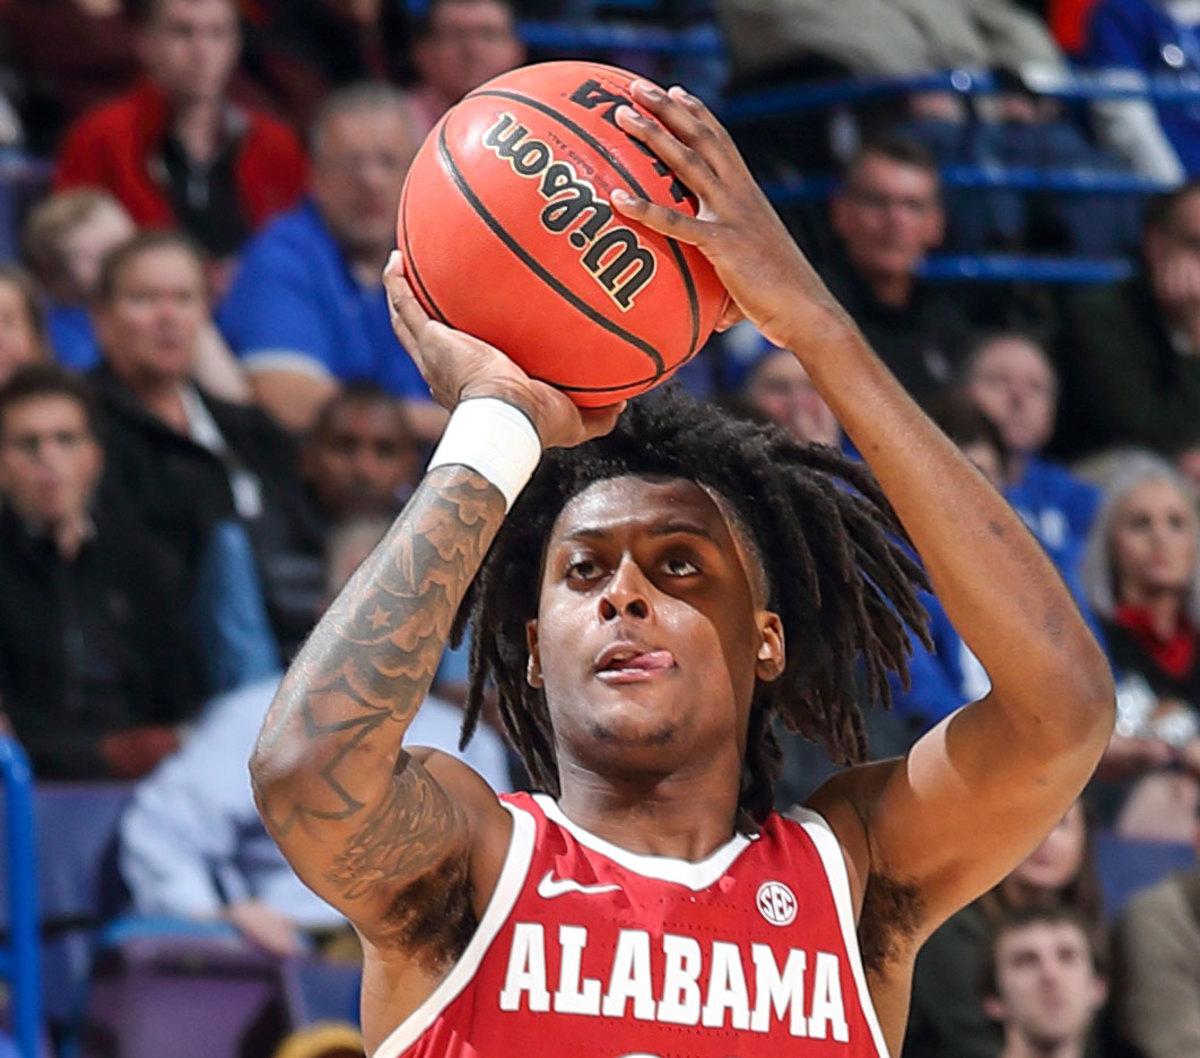 Alabama Basketball: John Petty